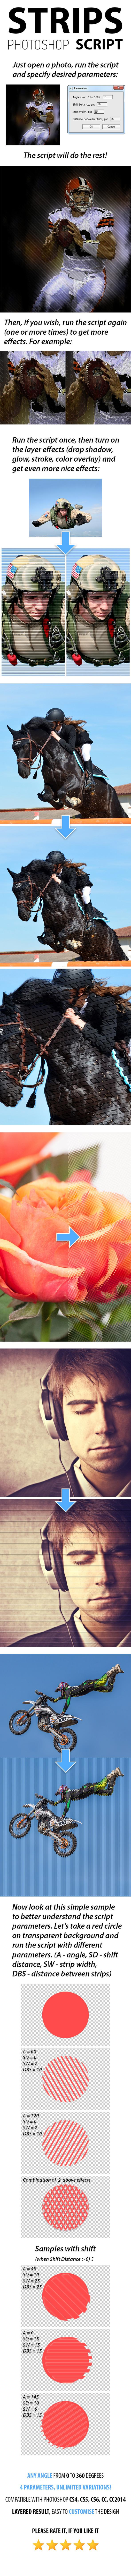 GraphicRiver Strips Photoshop Script 11630801